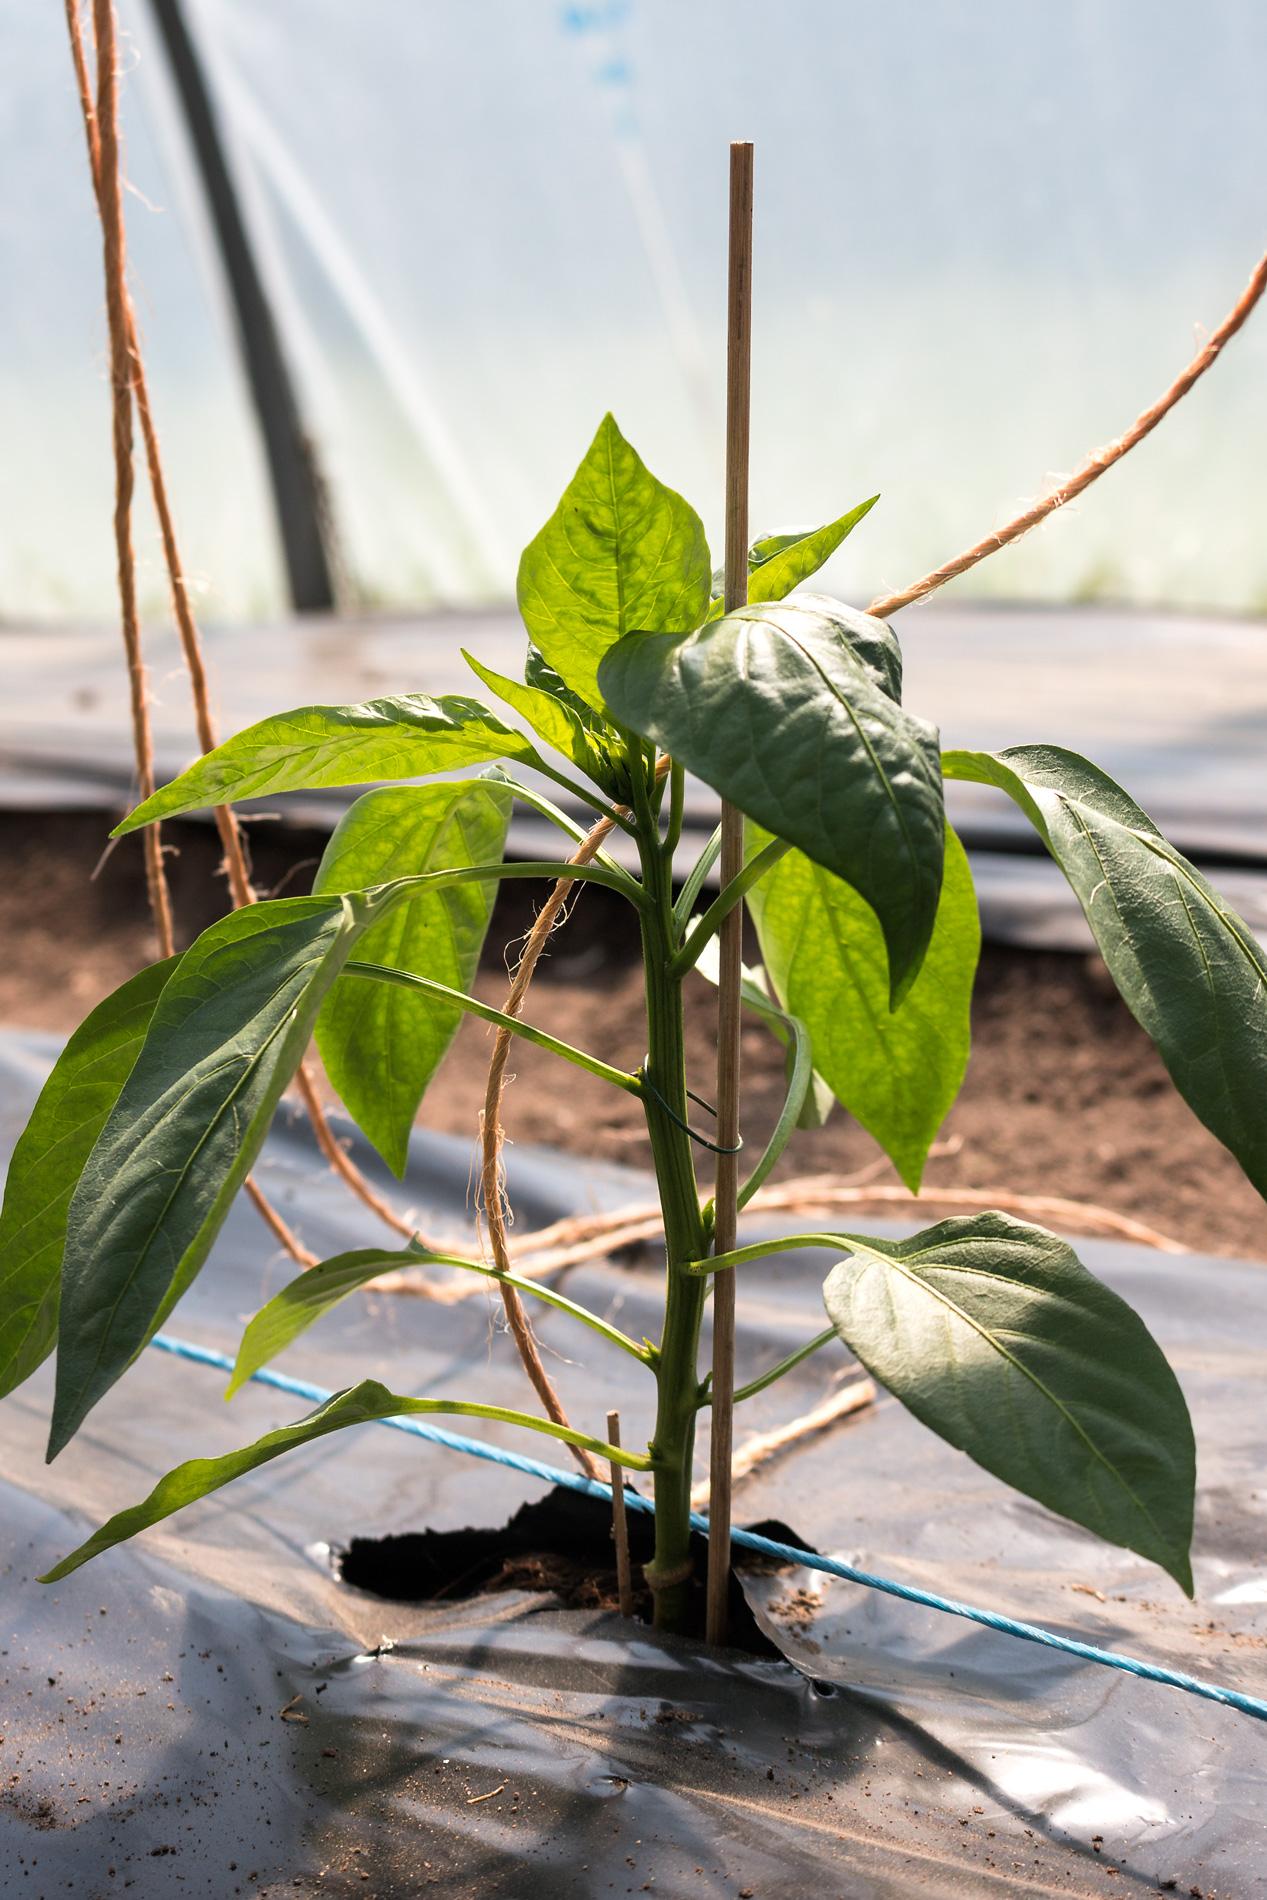 Paprikapflanze mit Kordel